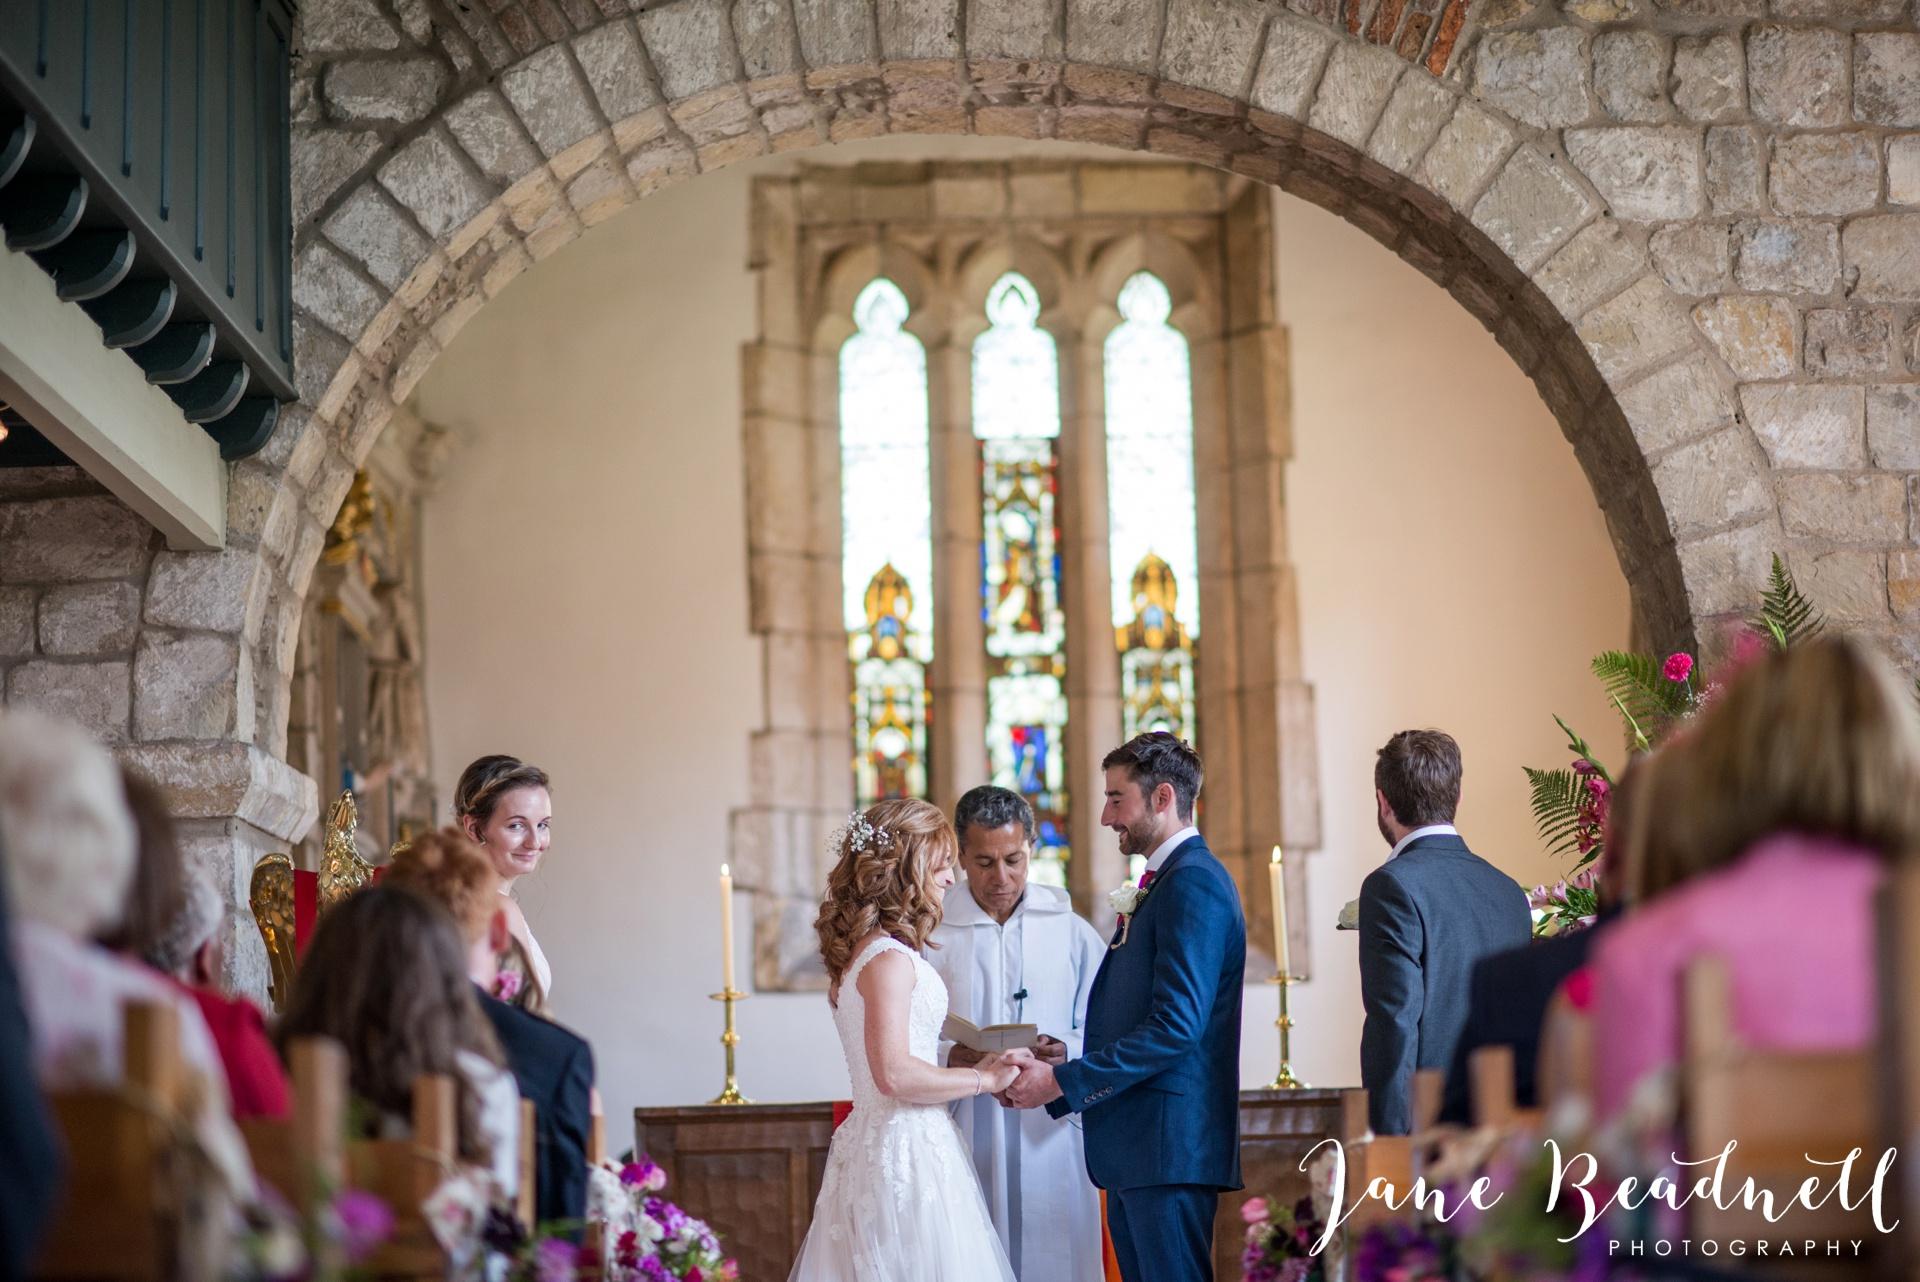 yorkshire-fine-art-wedding-photographer-jane-beadnell-photography-poppleton-york_0047